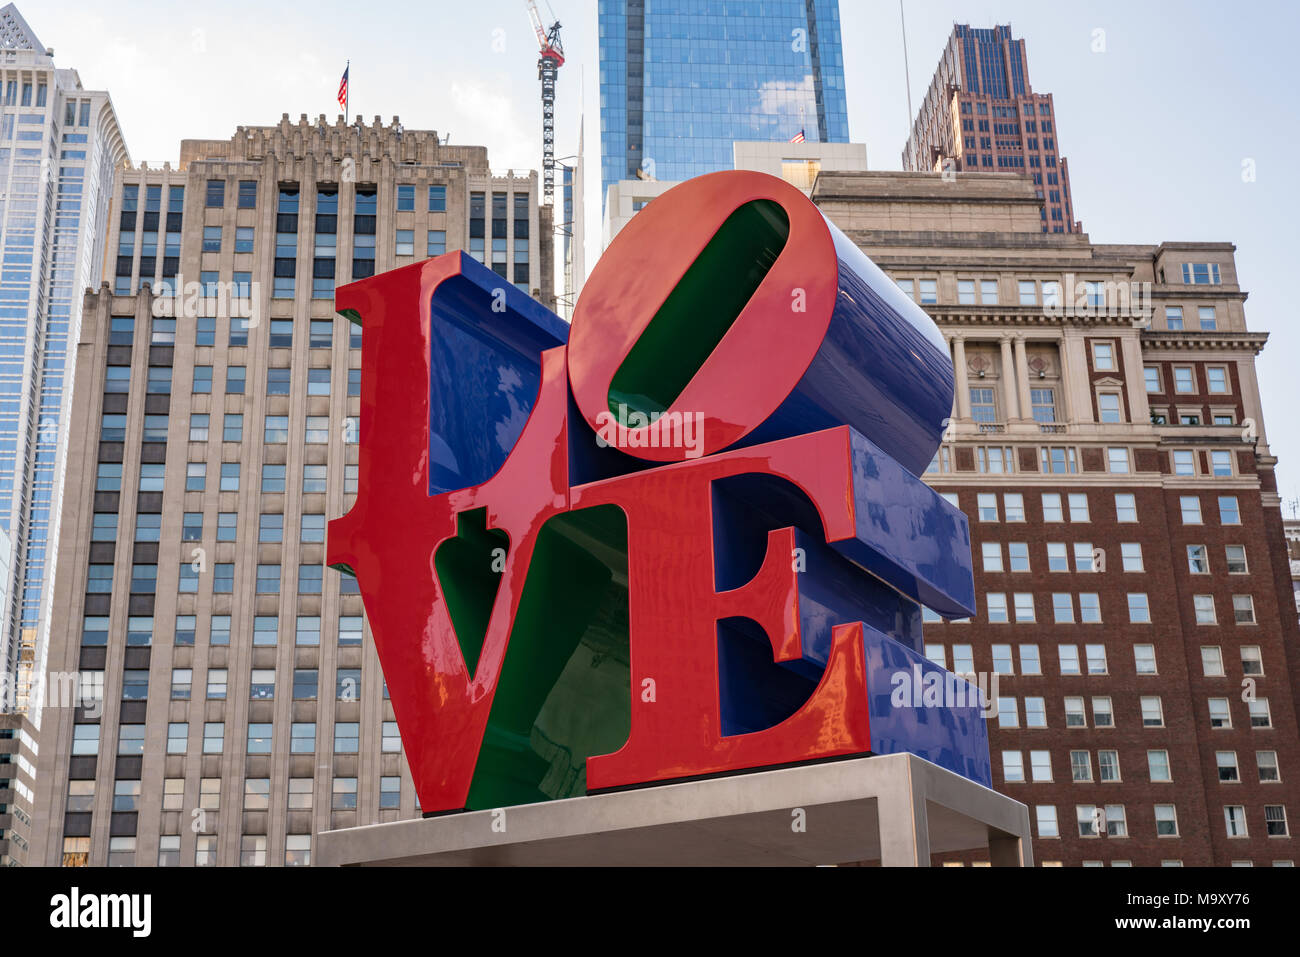 PHILADELPHIA, PA - MARCH 10, 2018: Newly restored LOVE sculpture in Love Park in Philadelphia, Pennsylvania - Stock Image